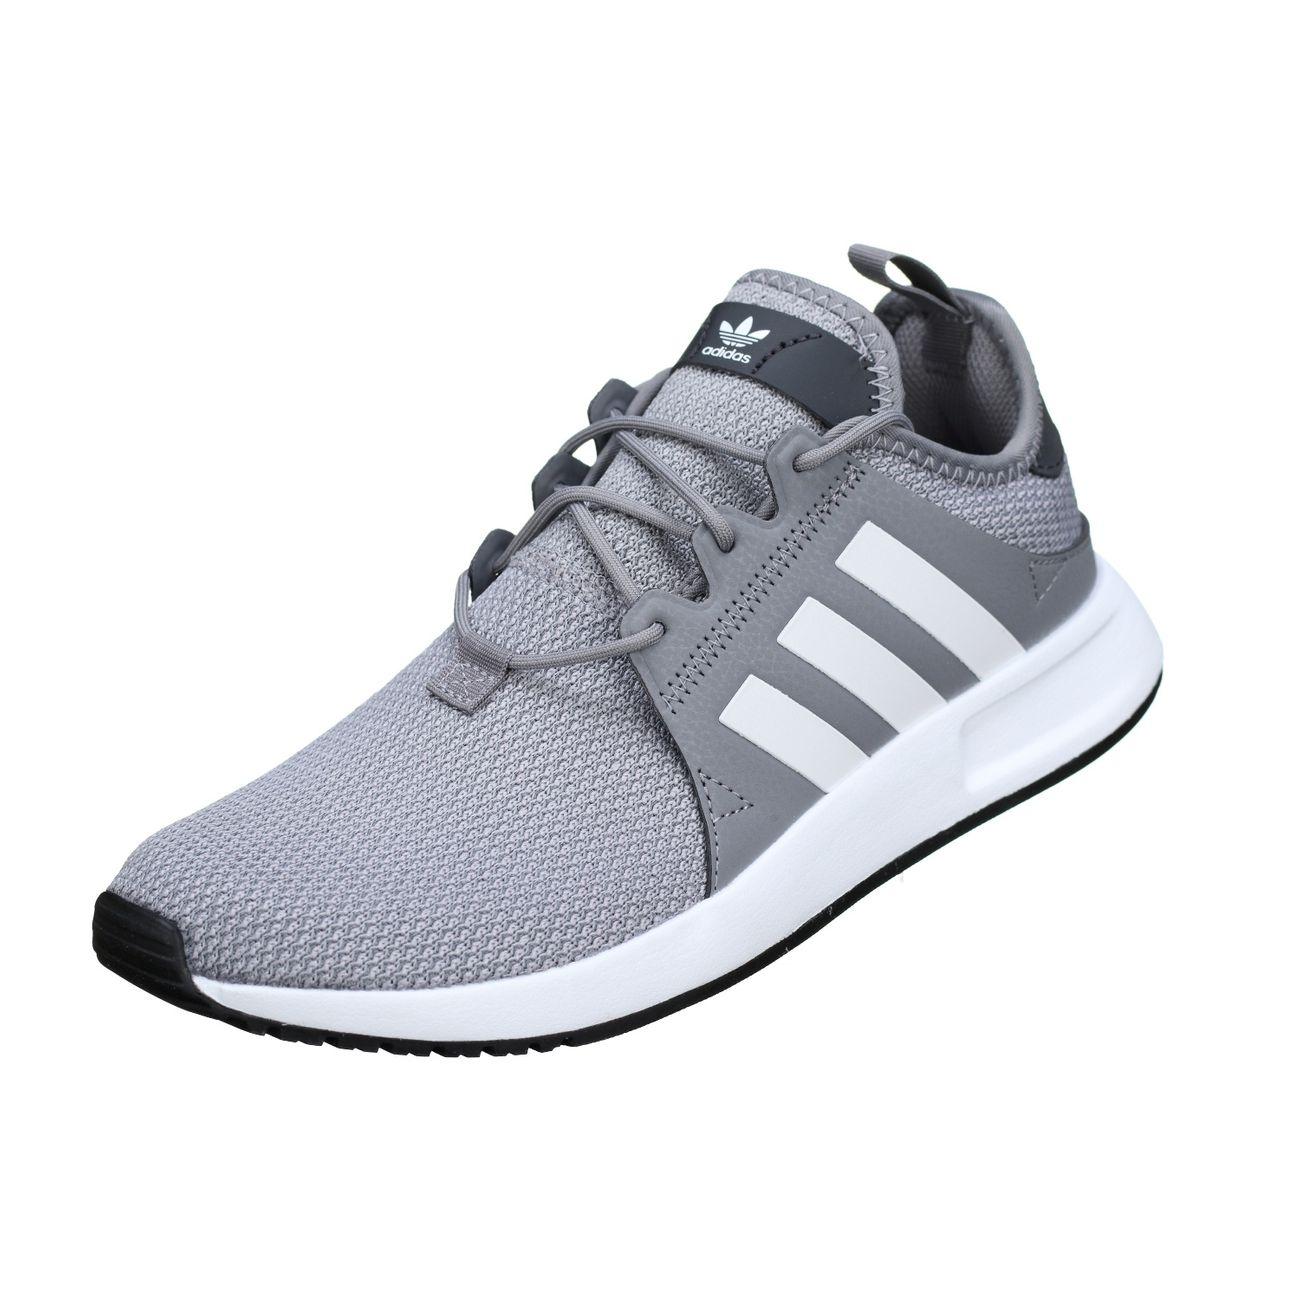 Gris plr Adidas X Basket Cq2408 QsCxhtrd